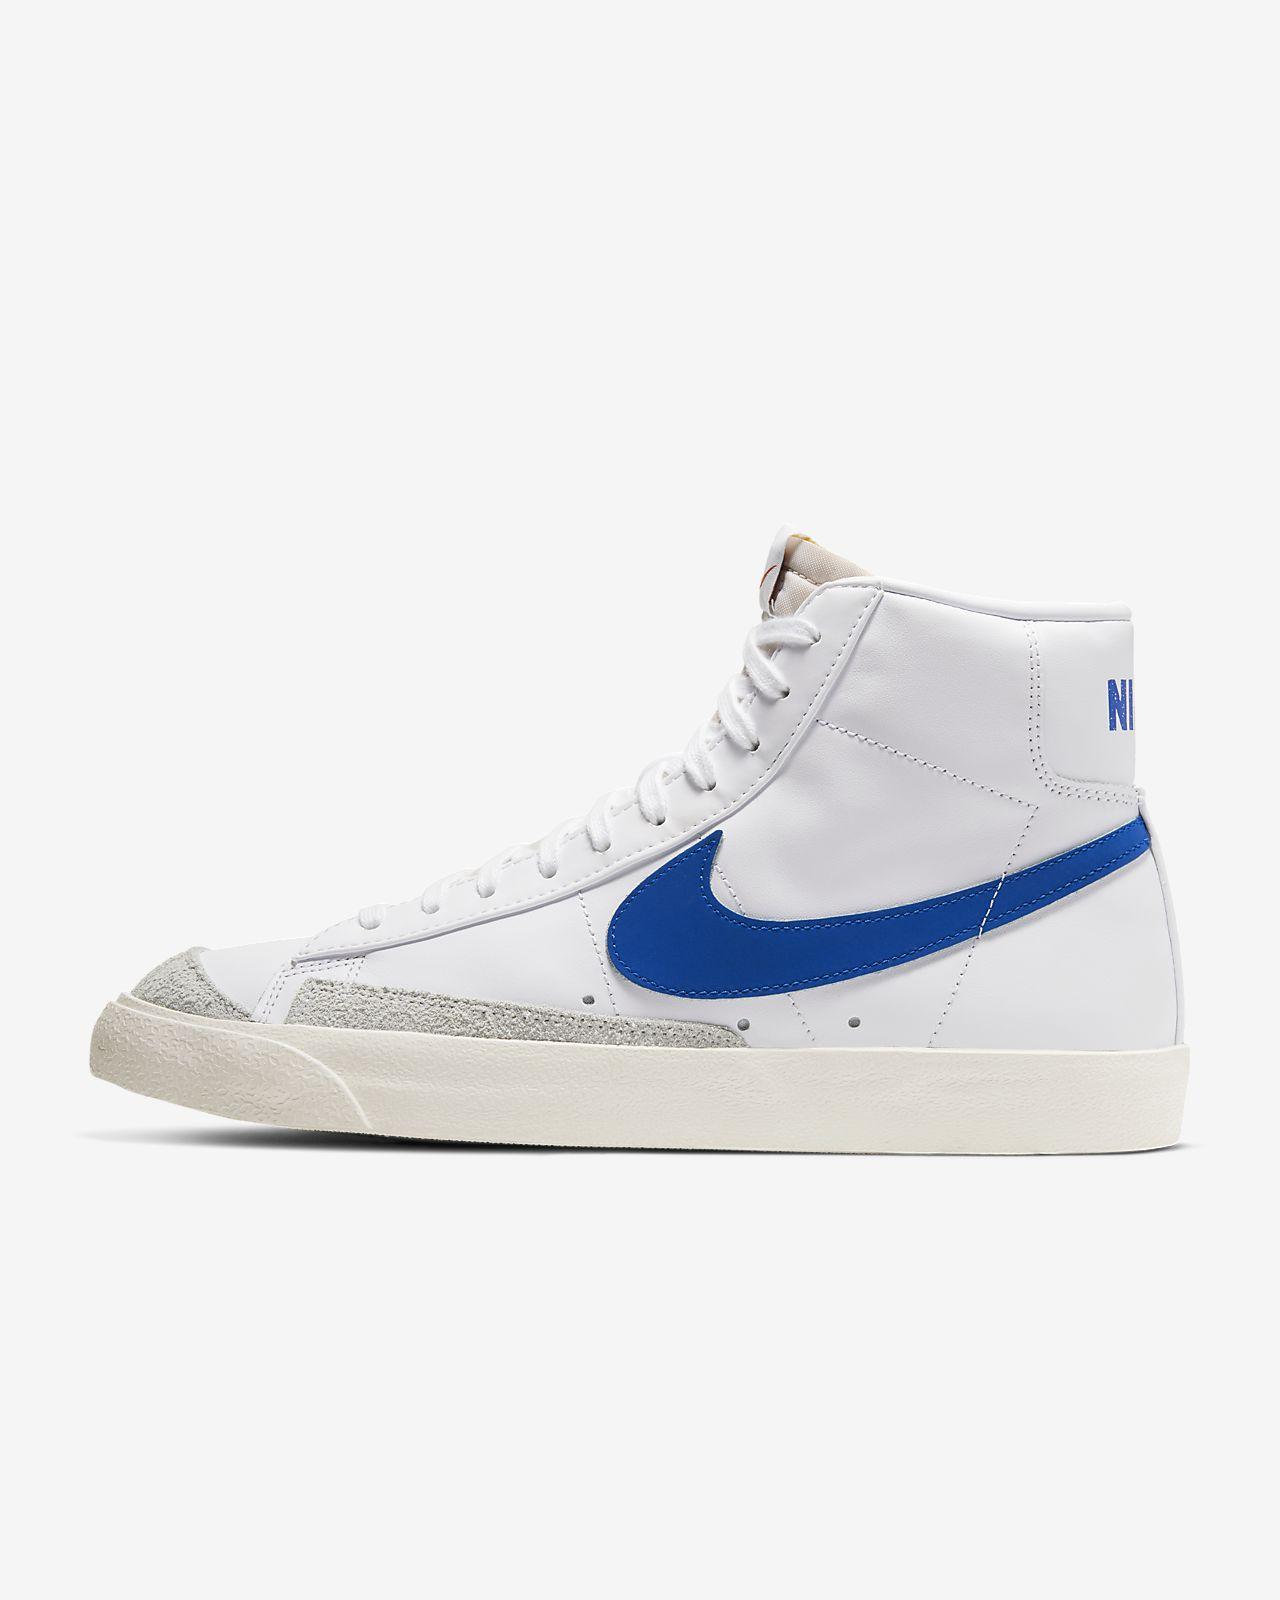 Nike Blazer High Vintage shoes black grey